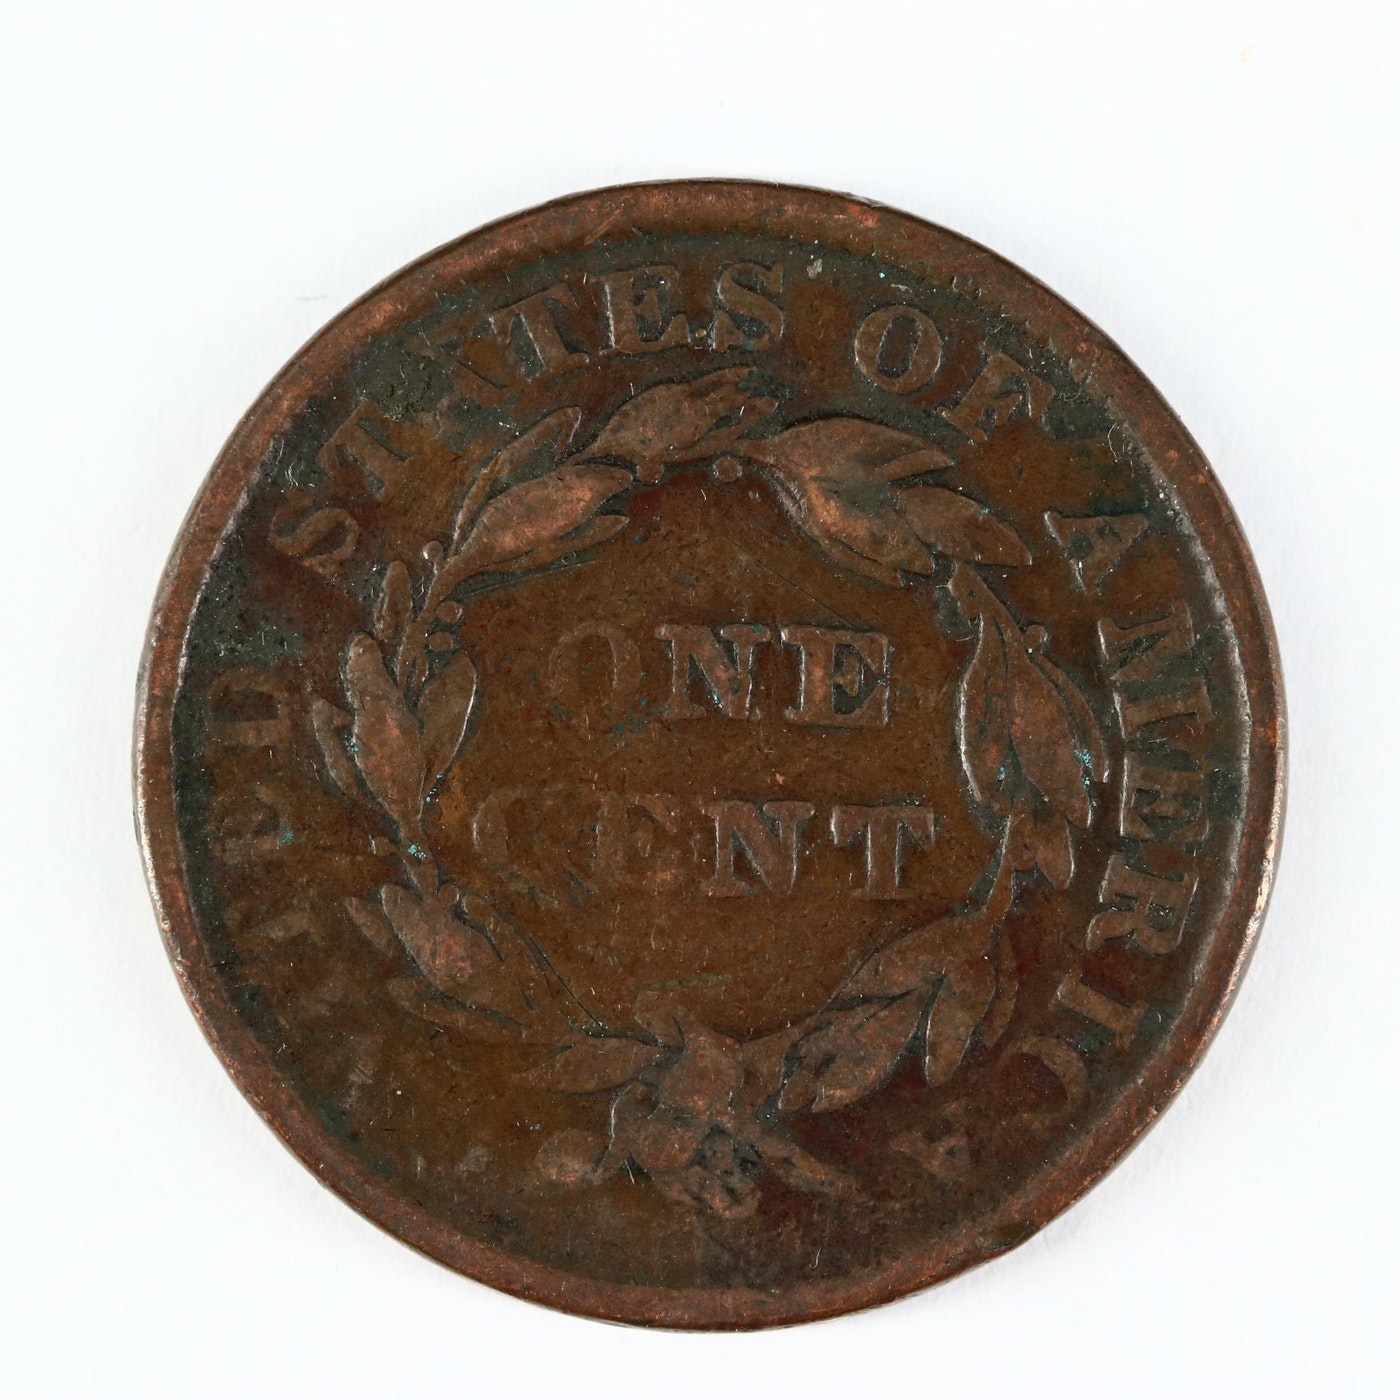 Lot - 1835 US 1c Coronet Head Large Cent W/ Small Stars